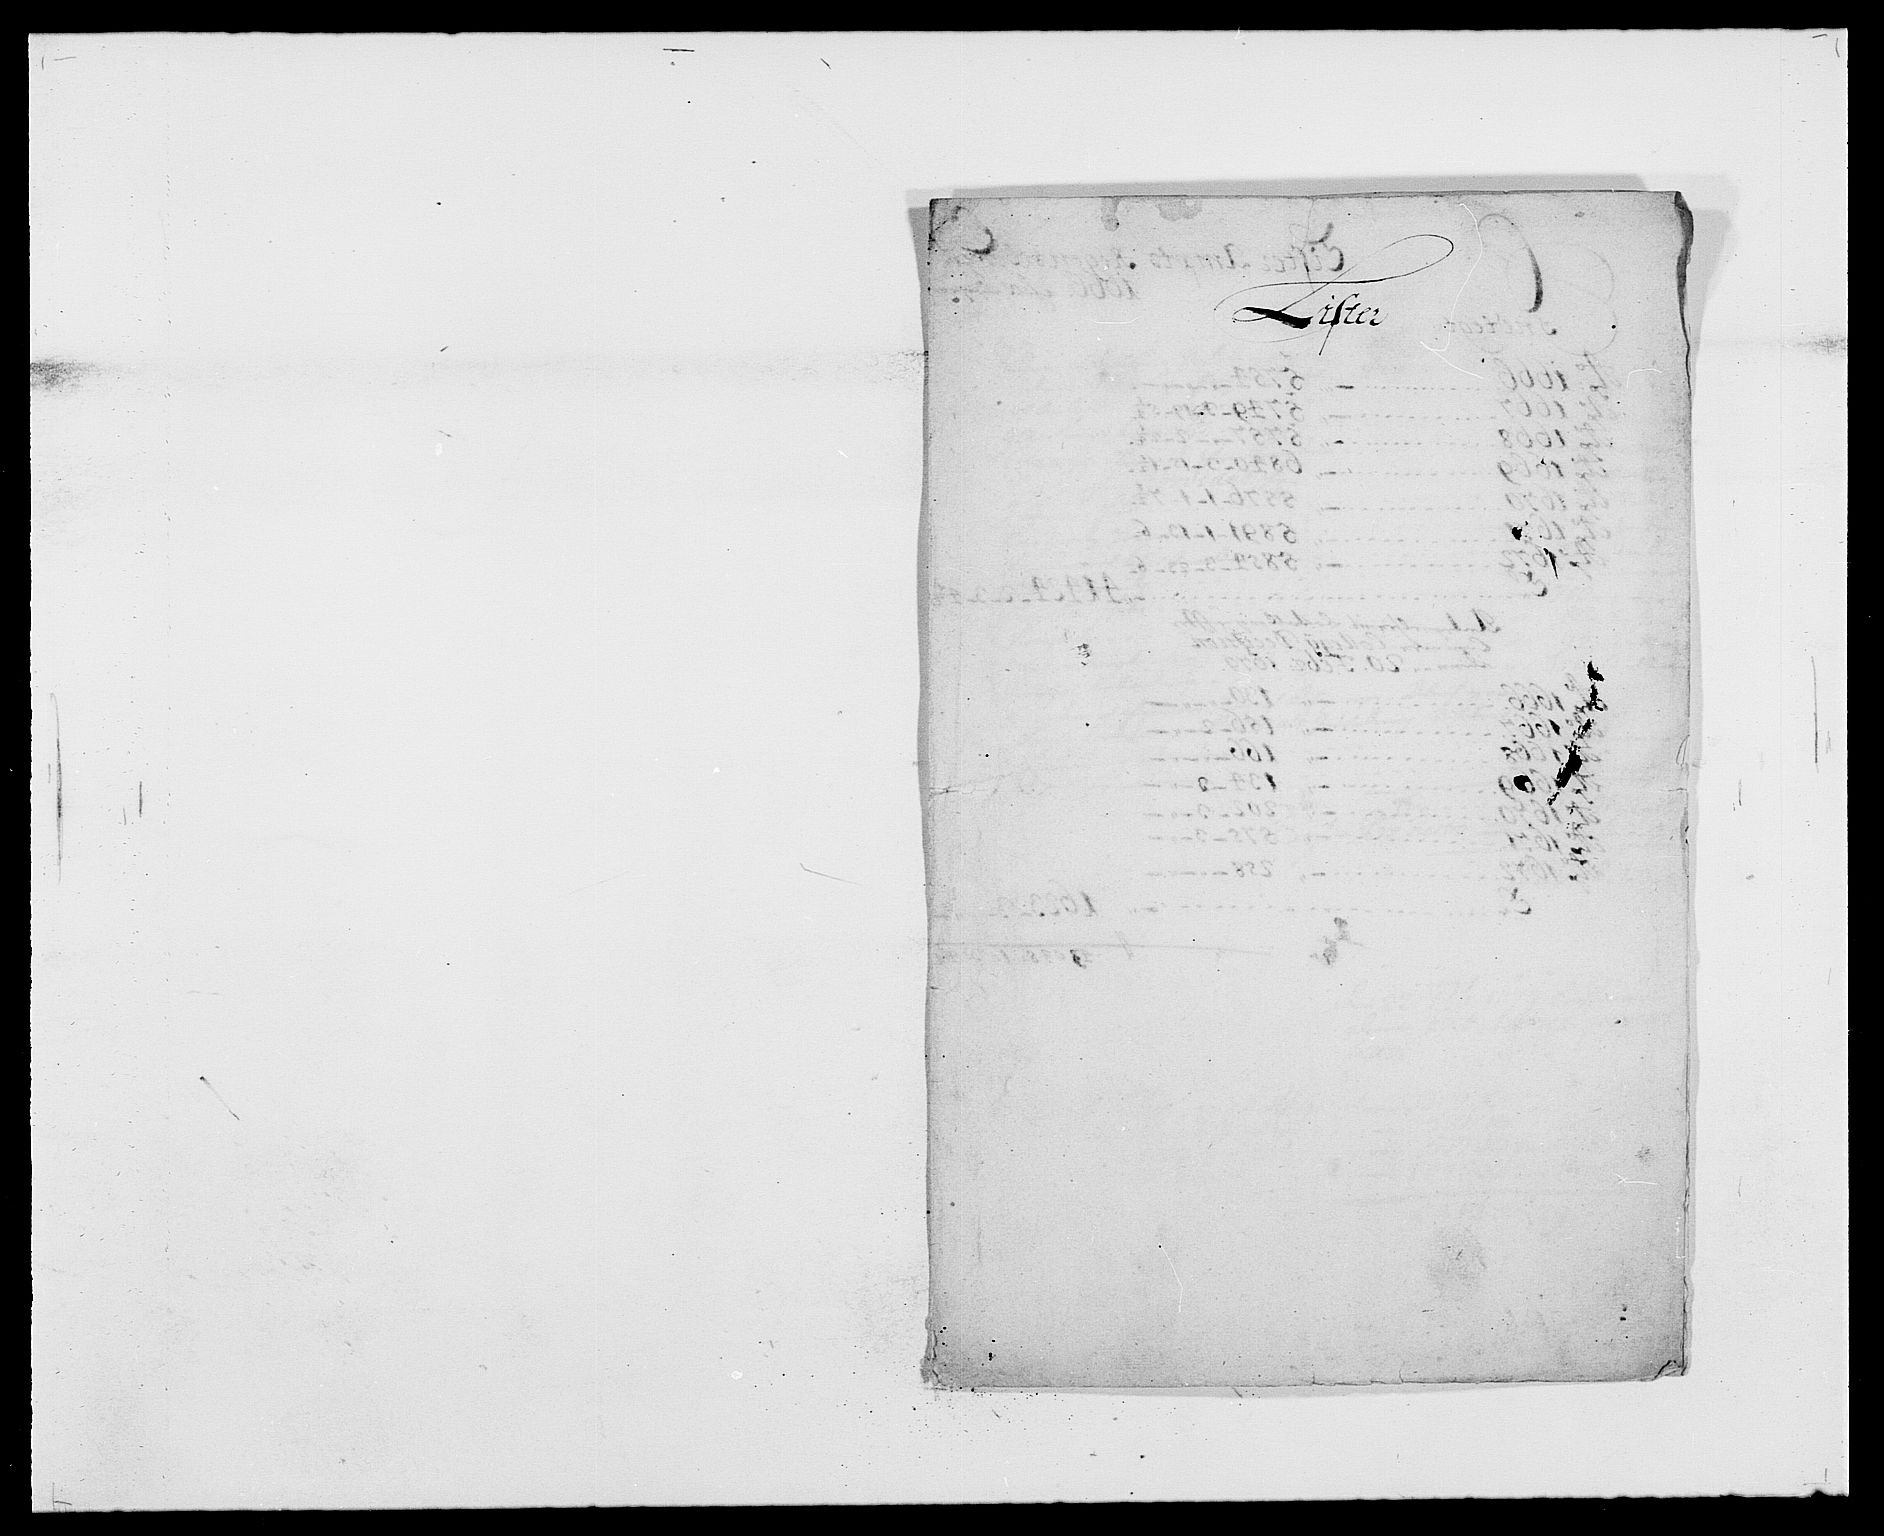 RA, Rentekammeret inntil 1814, Reviderte regnskaper, Fogderegnskap, R41/L2526: Fogderegnskap Lista, 1672, s. 226